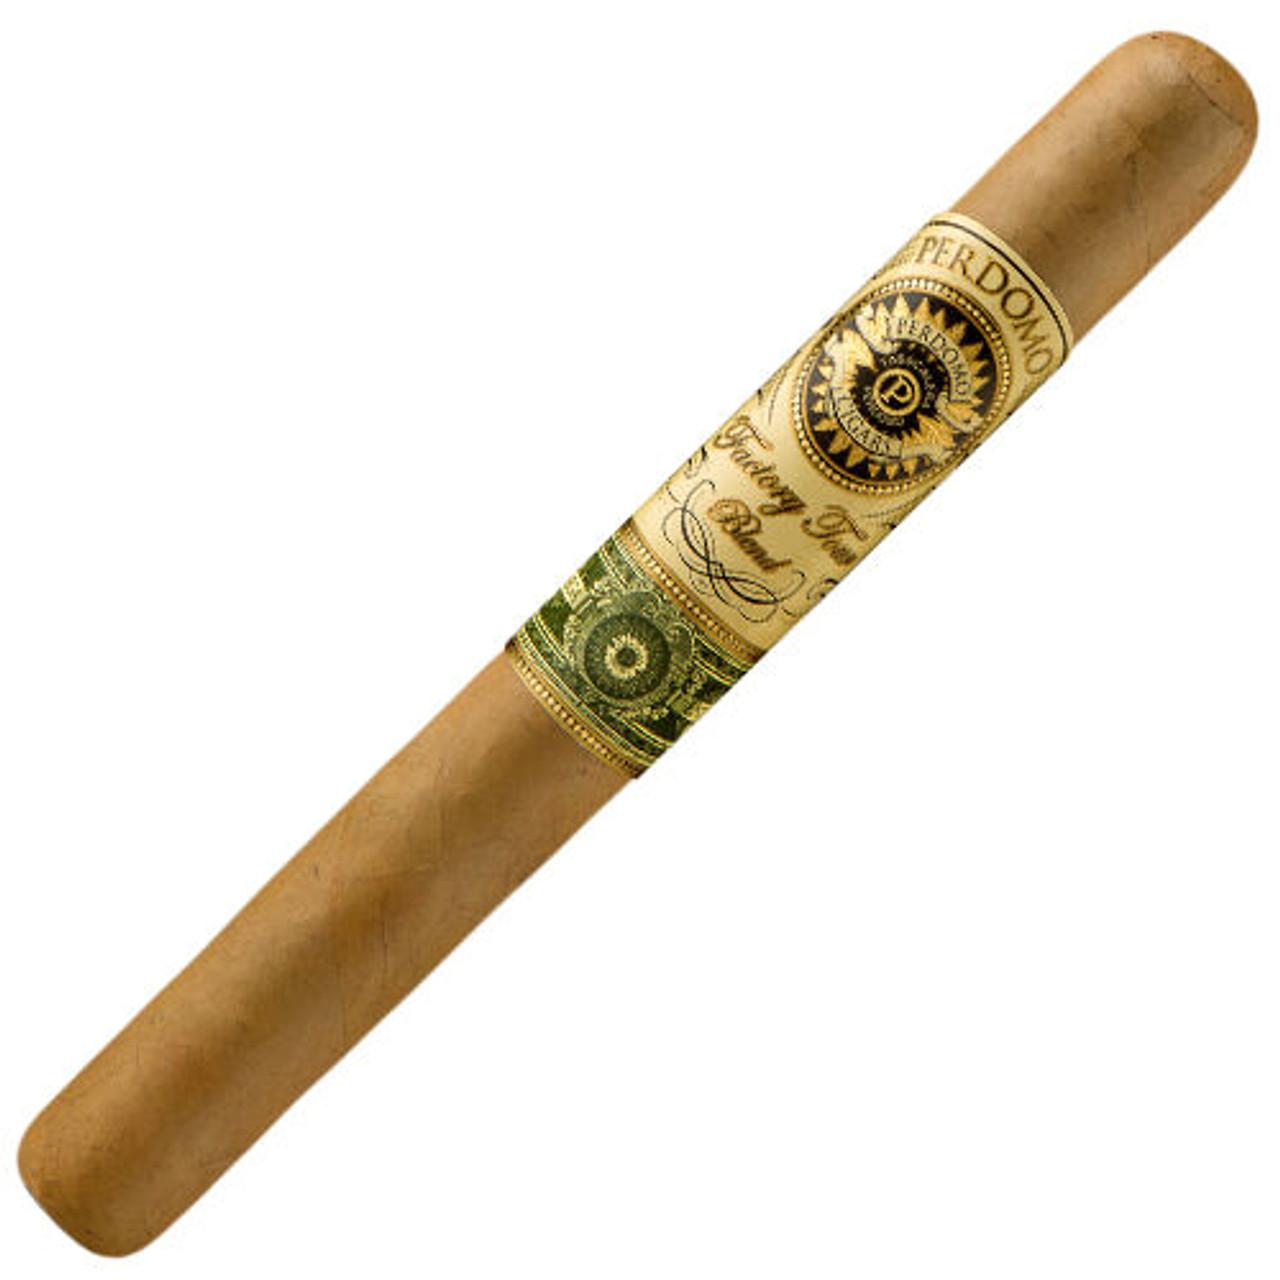 Perdomo Factory Tour Blend Connecticut Churchill Cigars - 7.0 x 52 (Box of 24)